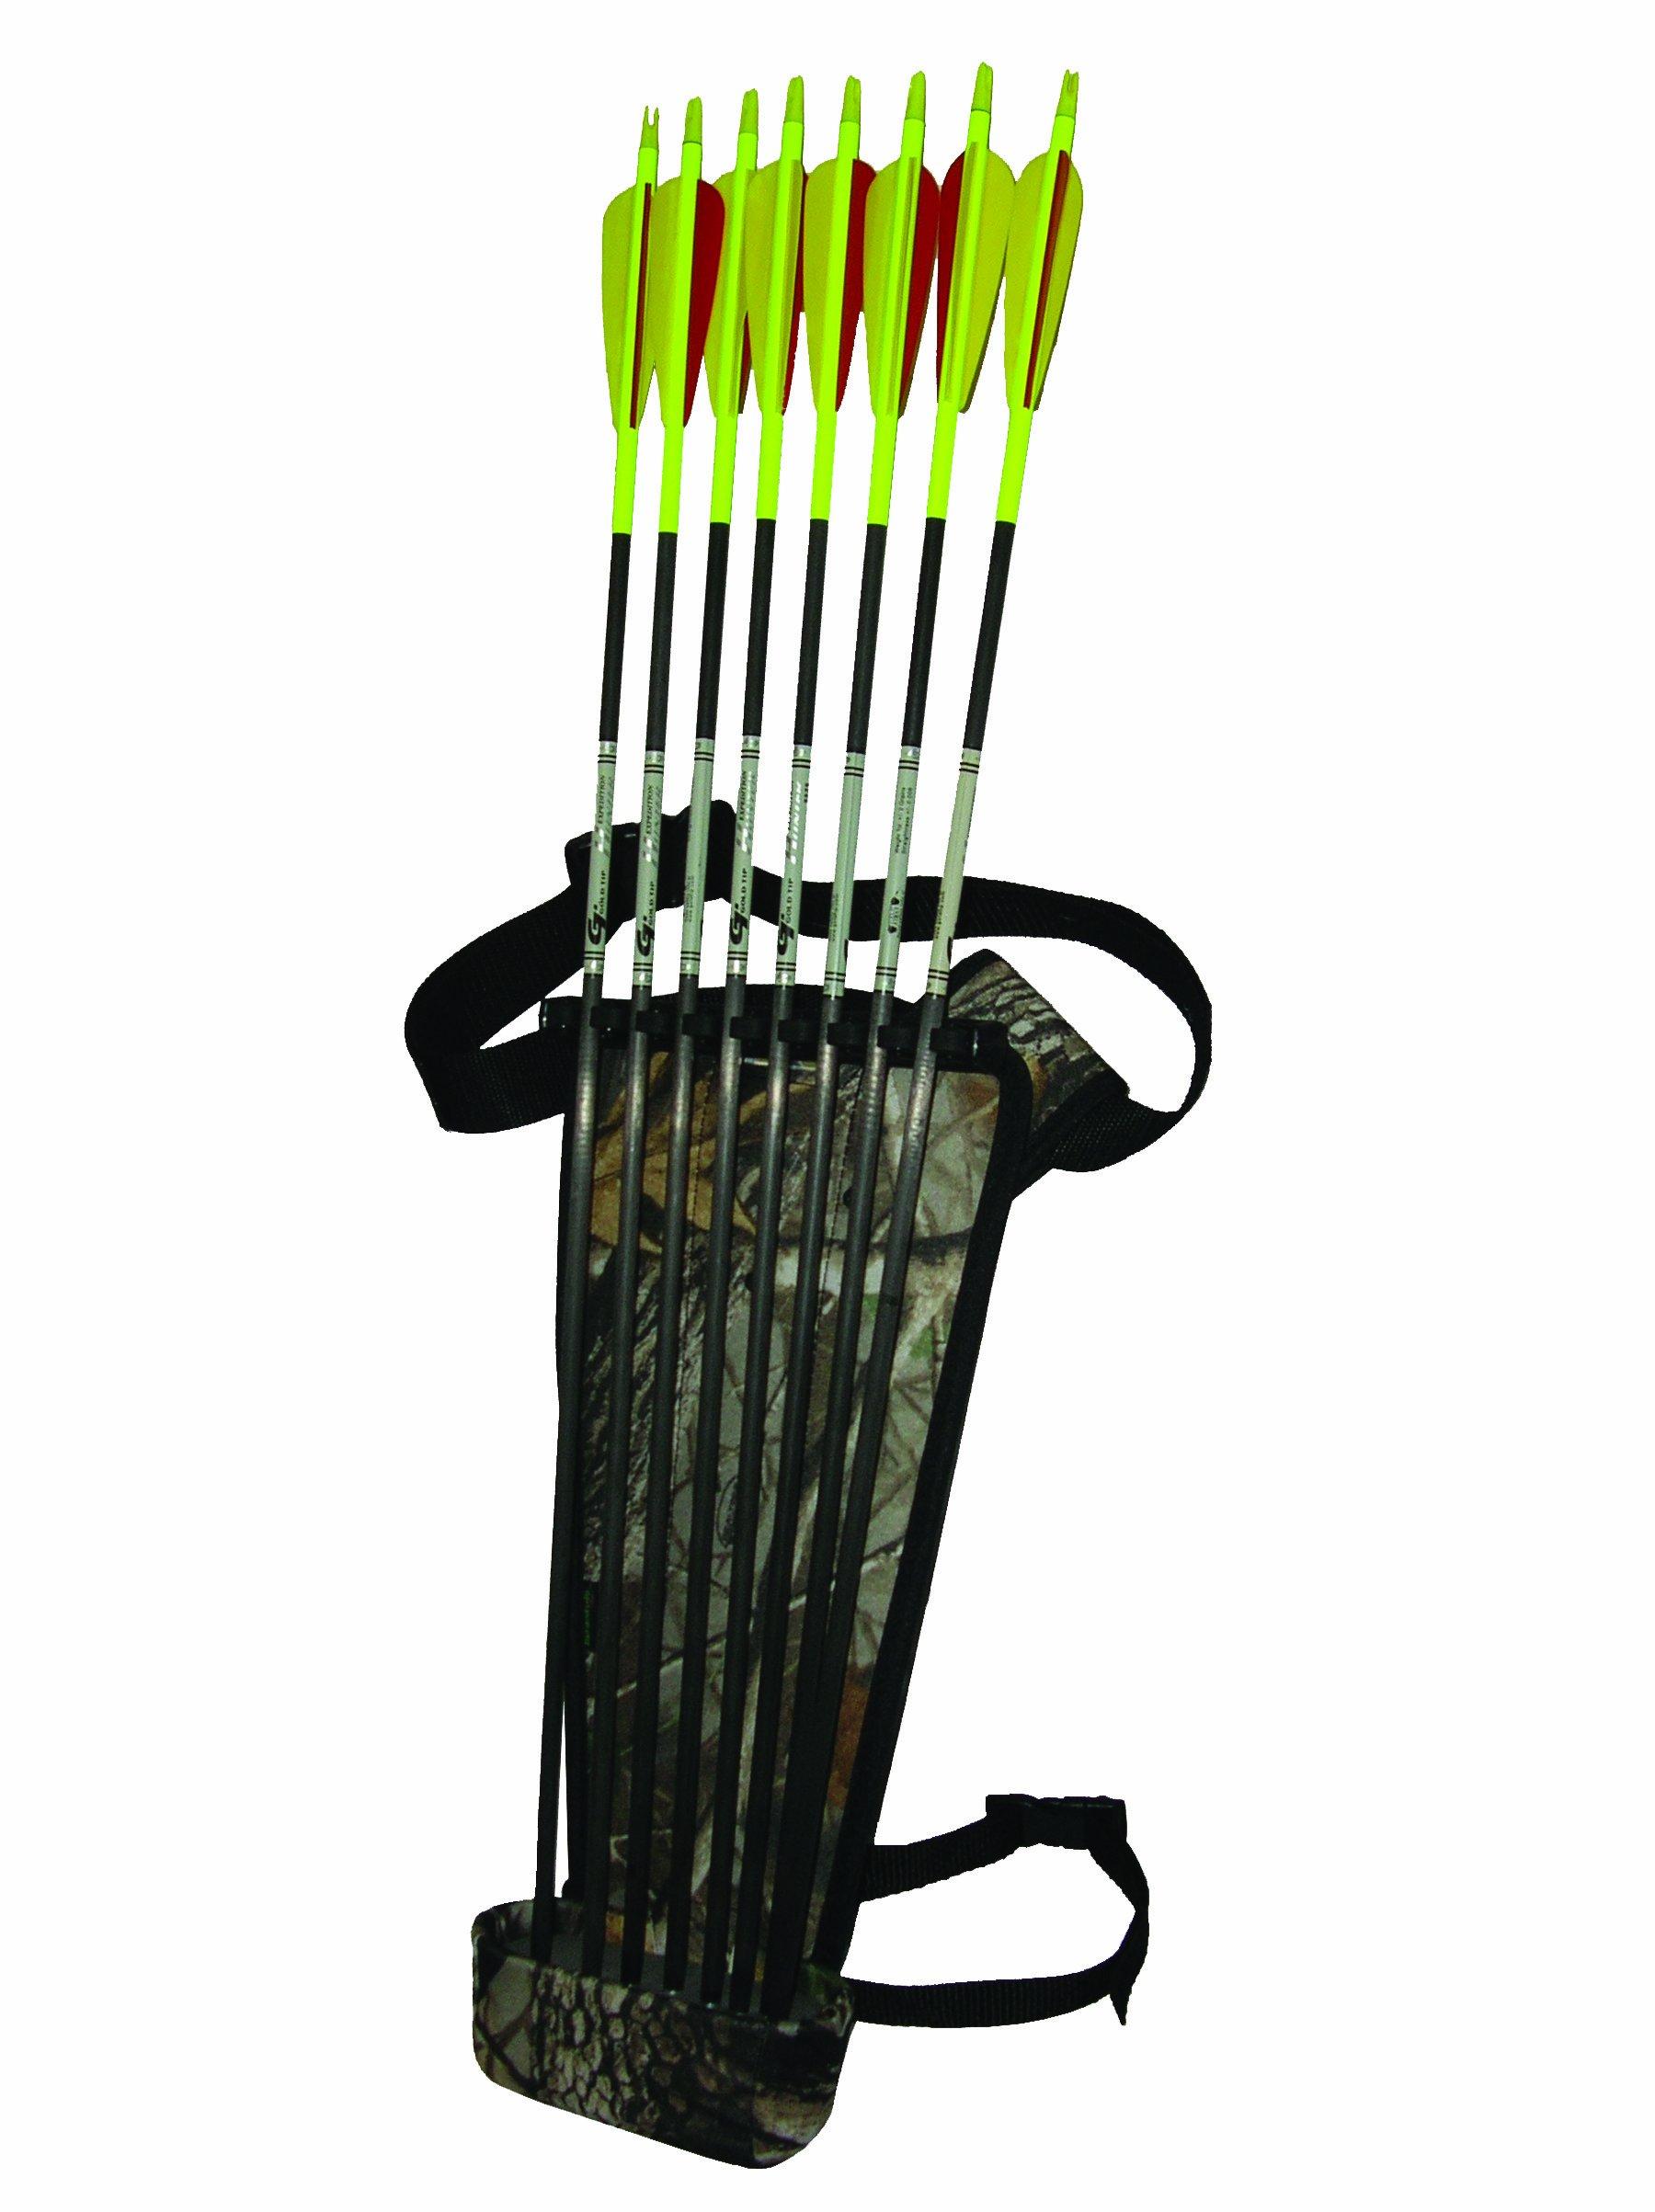 Sportsman's Outdoor Products Tarantula Broadhead Hip Quiver (Camo)